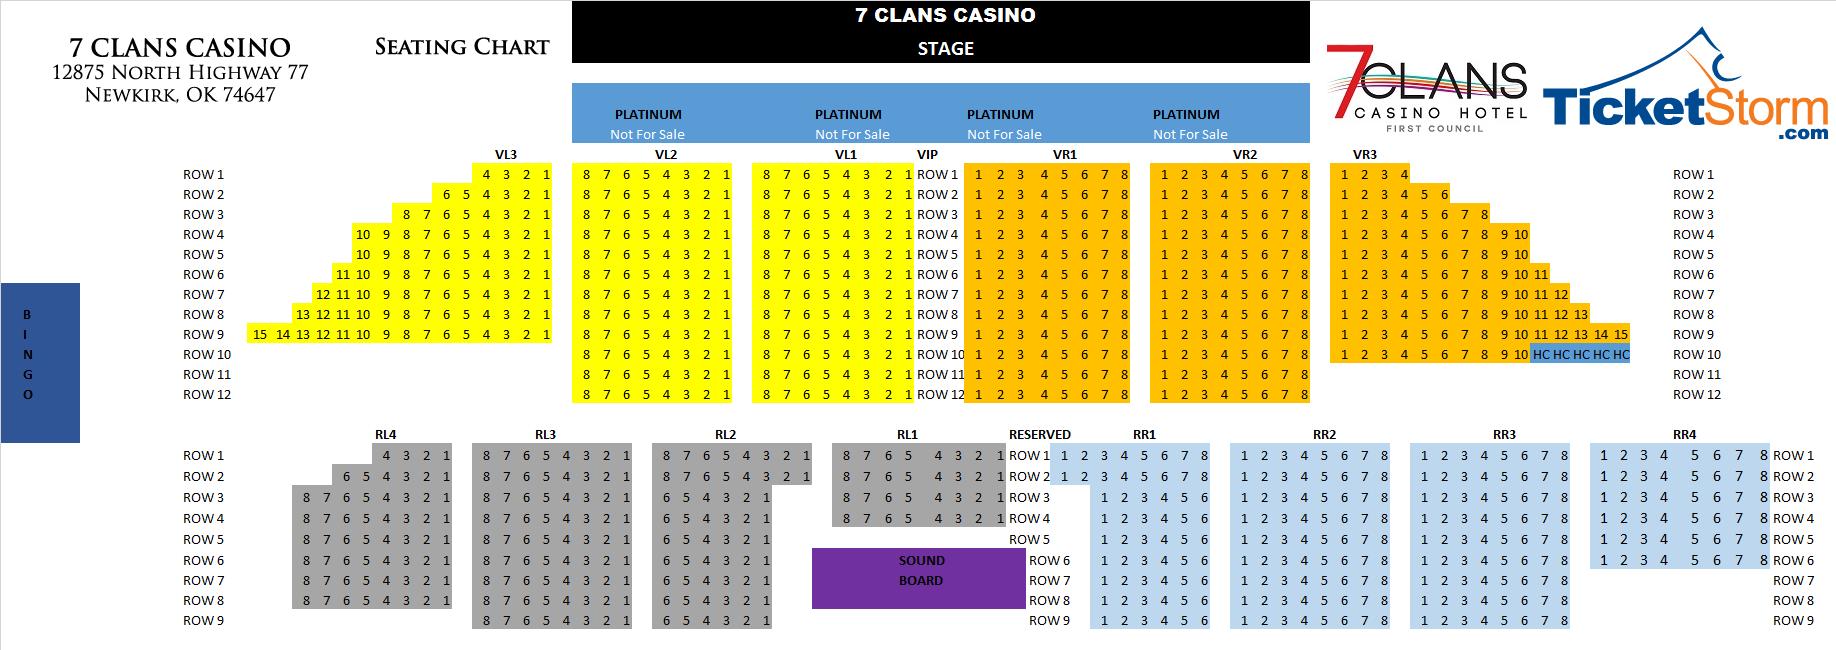 Entertainment 7 Clans Casinos